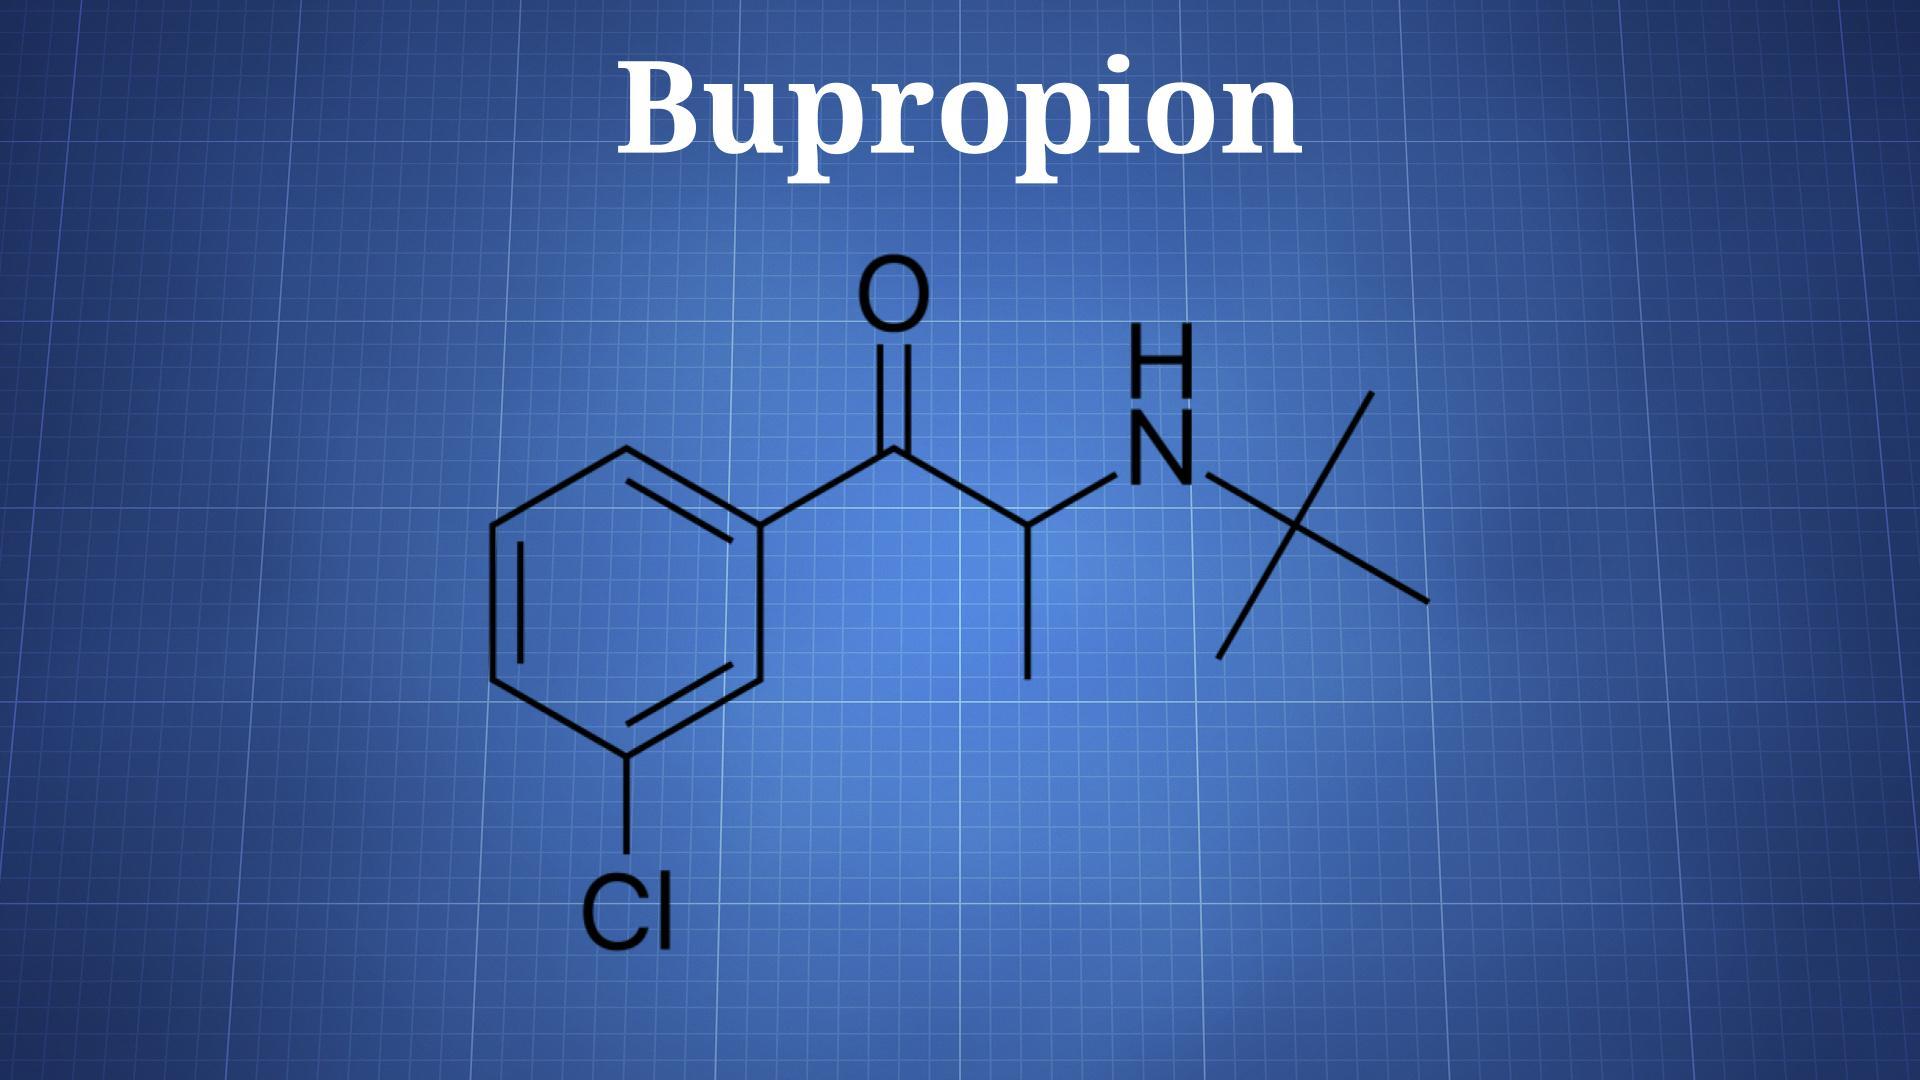 Bupropion - The Drug Classroom